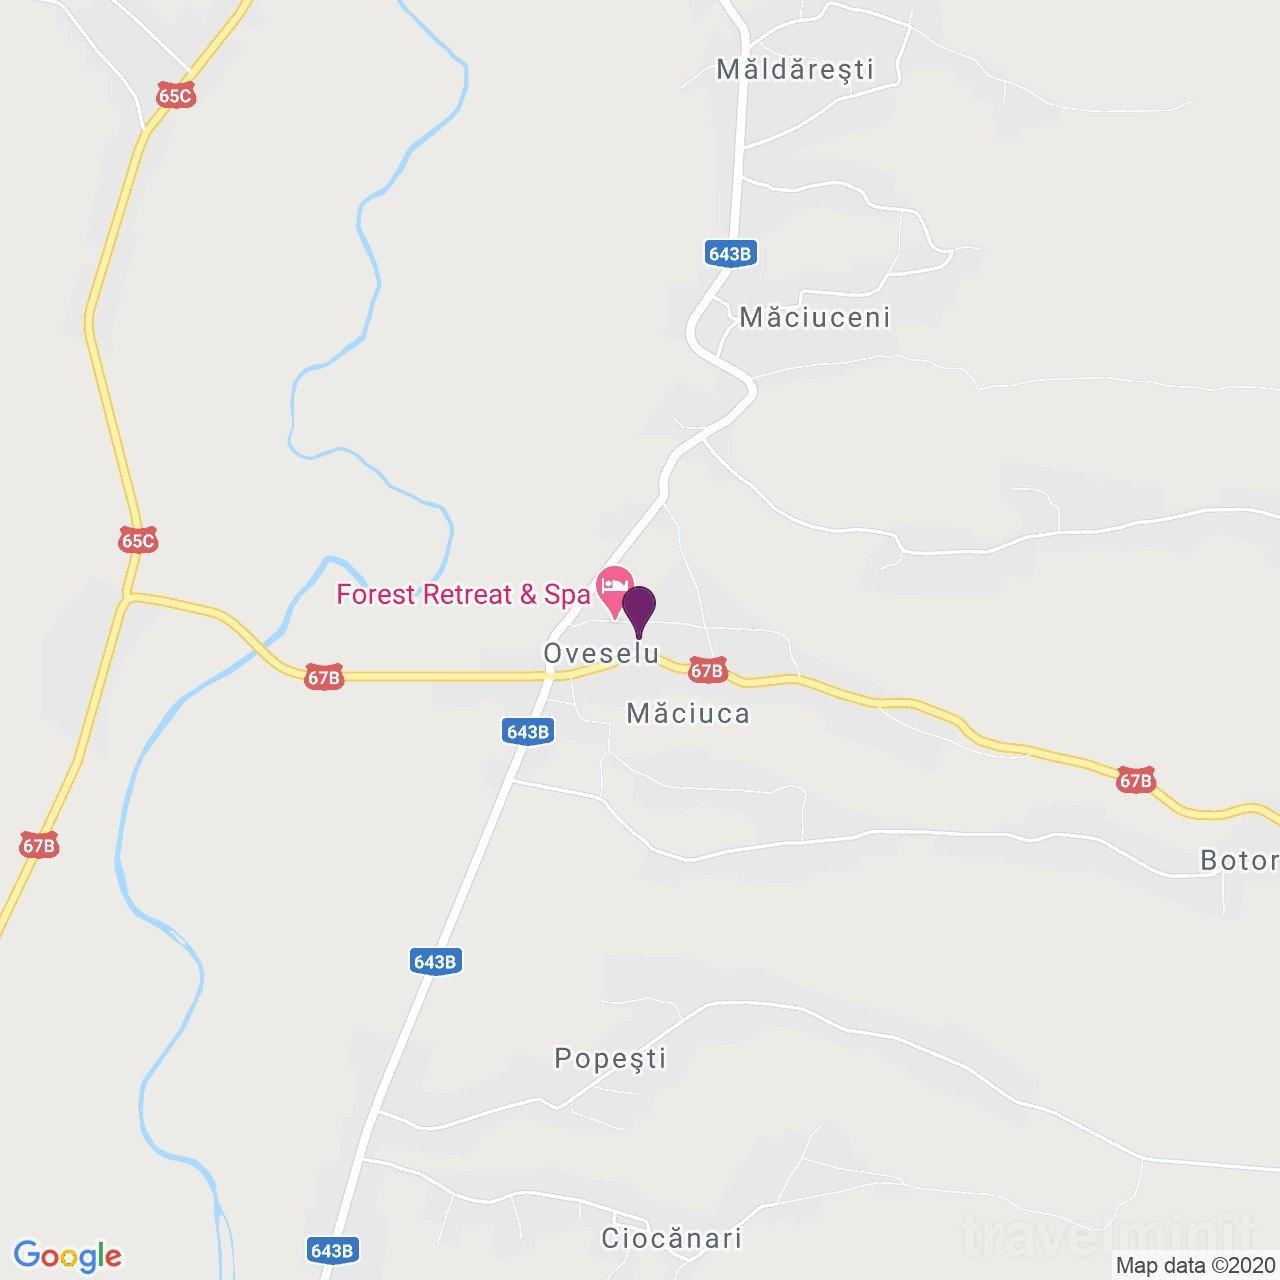 Hotel Forest Retreat & Spa Oveselu